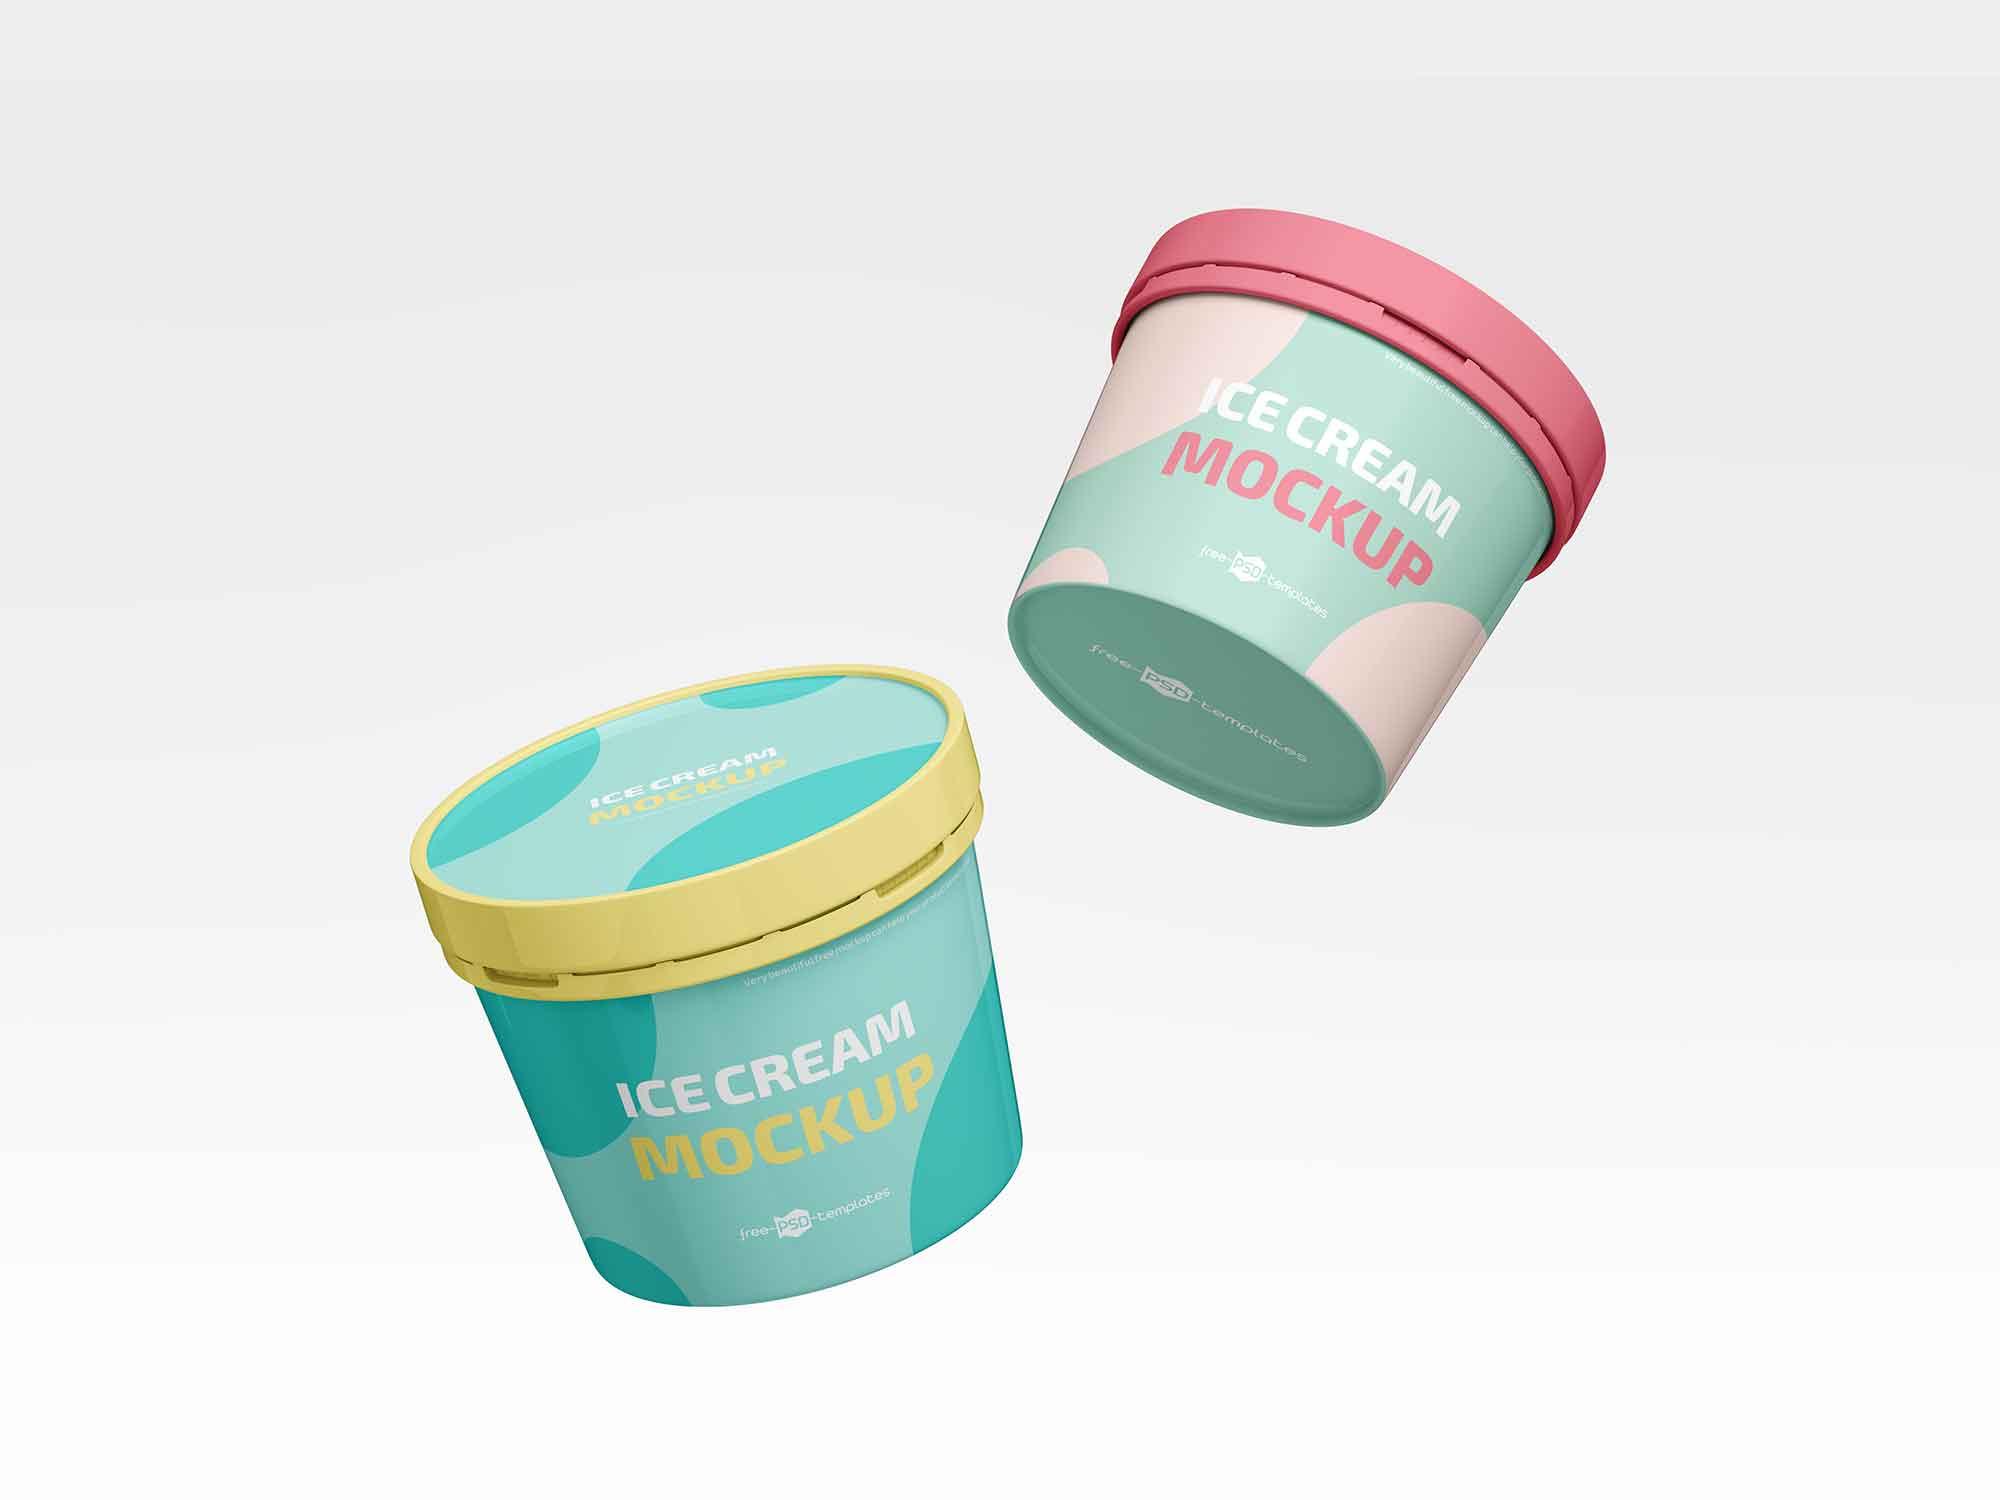 Ice Cream Plastic Jar Mockup 2